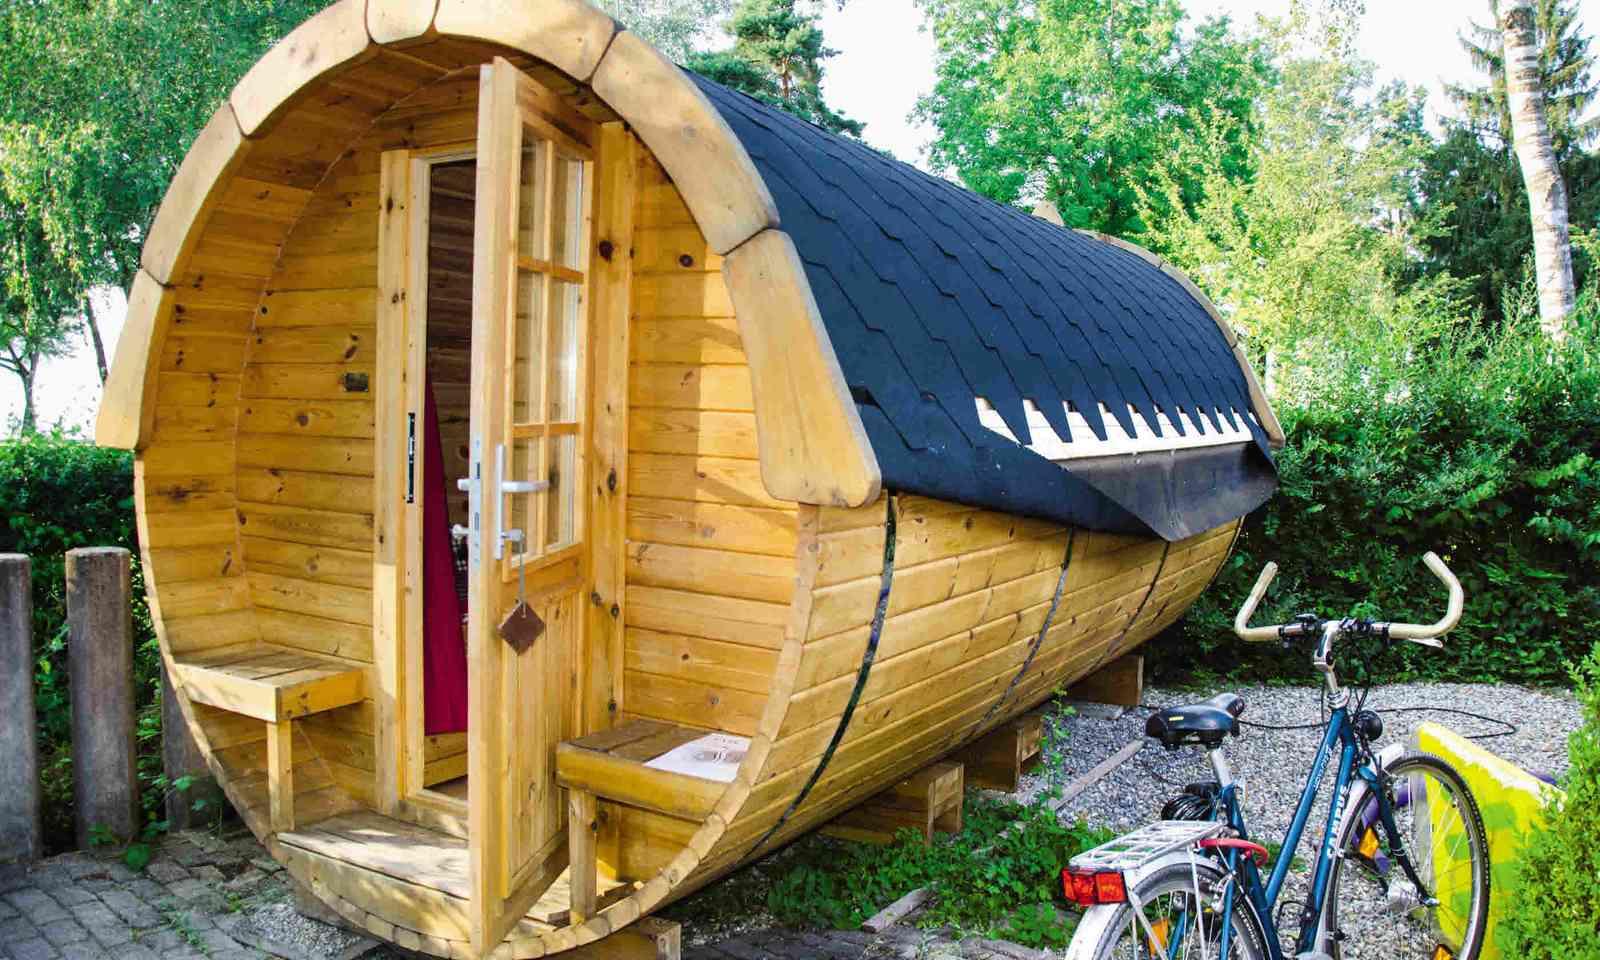 The wine barrel glamping pods at Klausenhorn Campsite (Neil S Price)